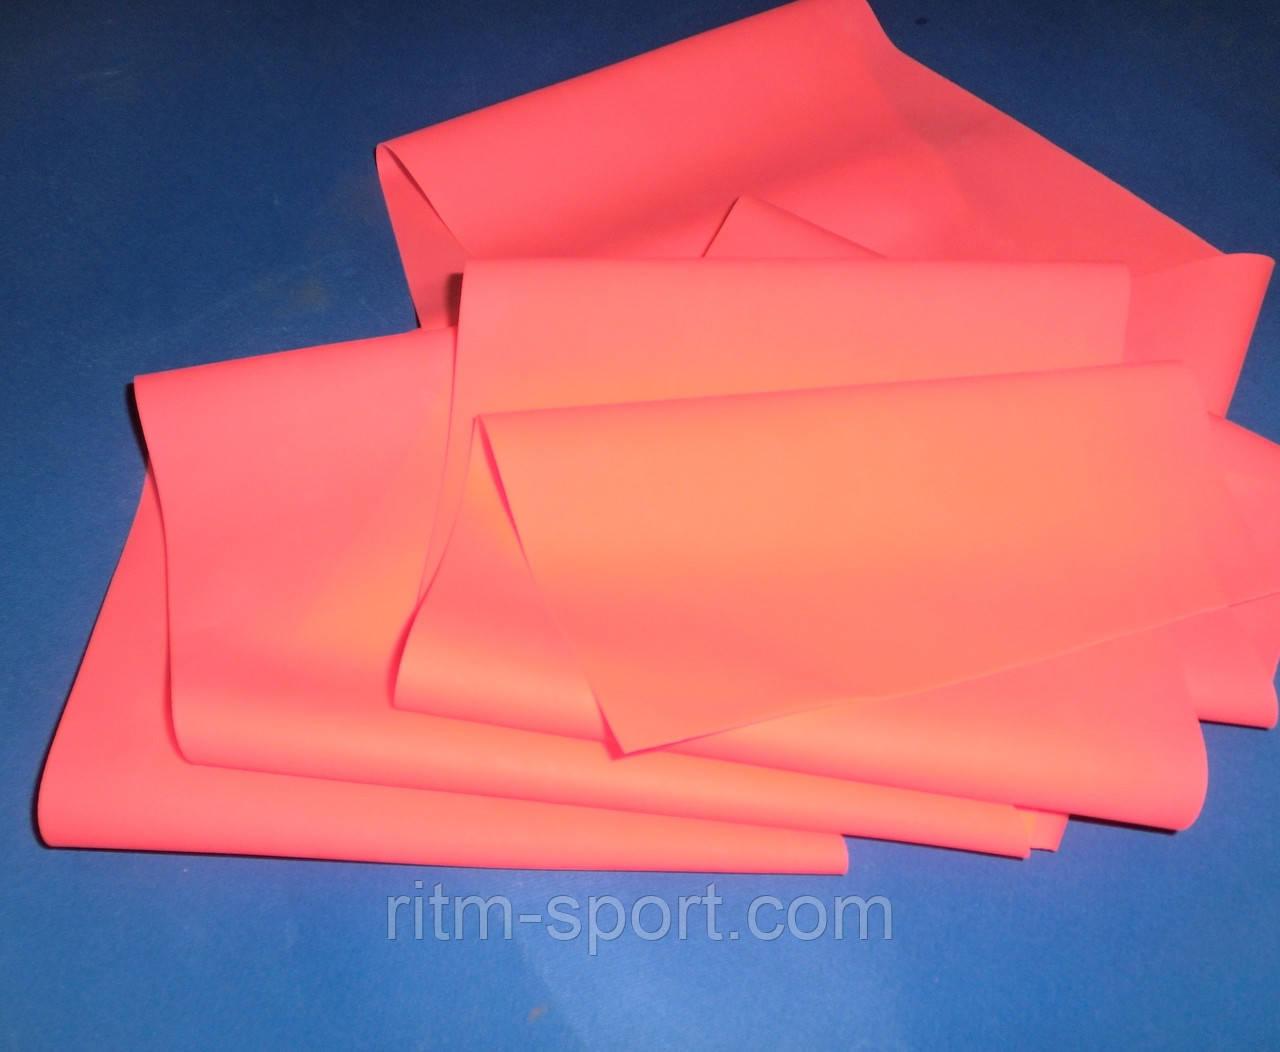 Лента эластичная для фитнеса 180 см (жесткость 1 - 20 кг)